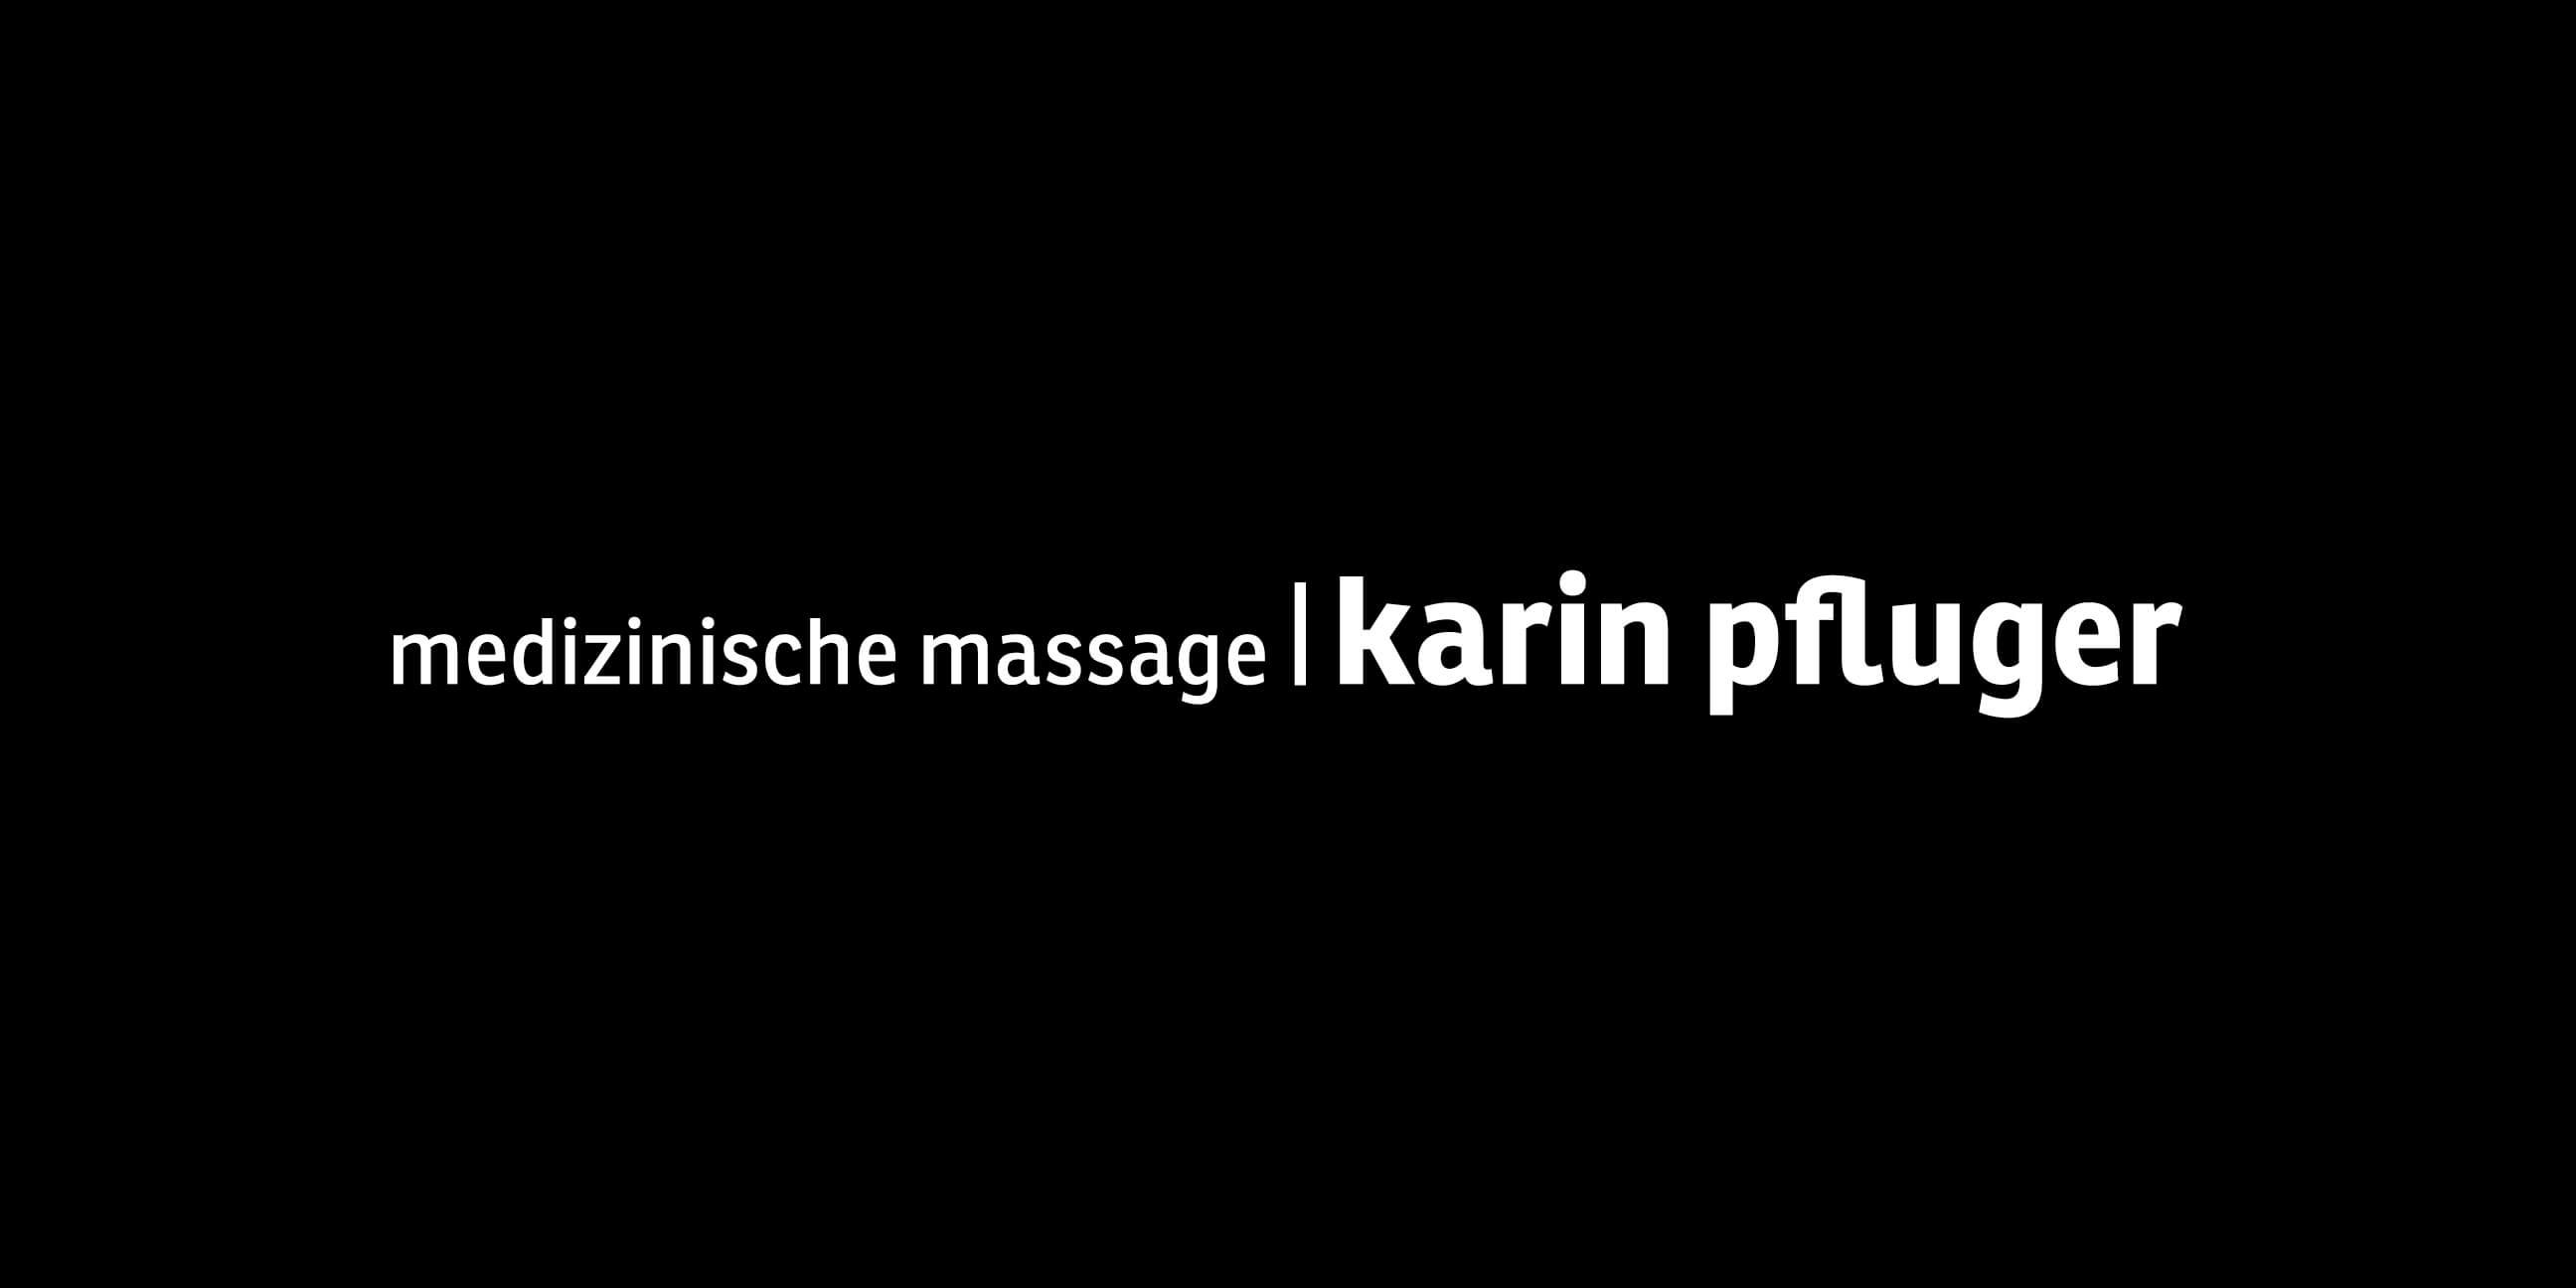 logo mmkp